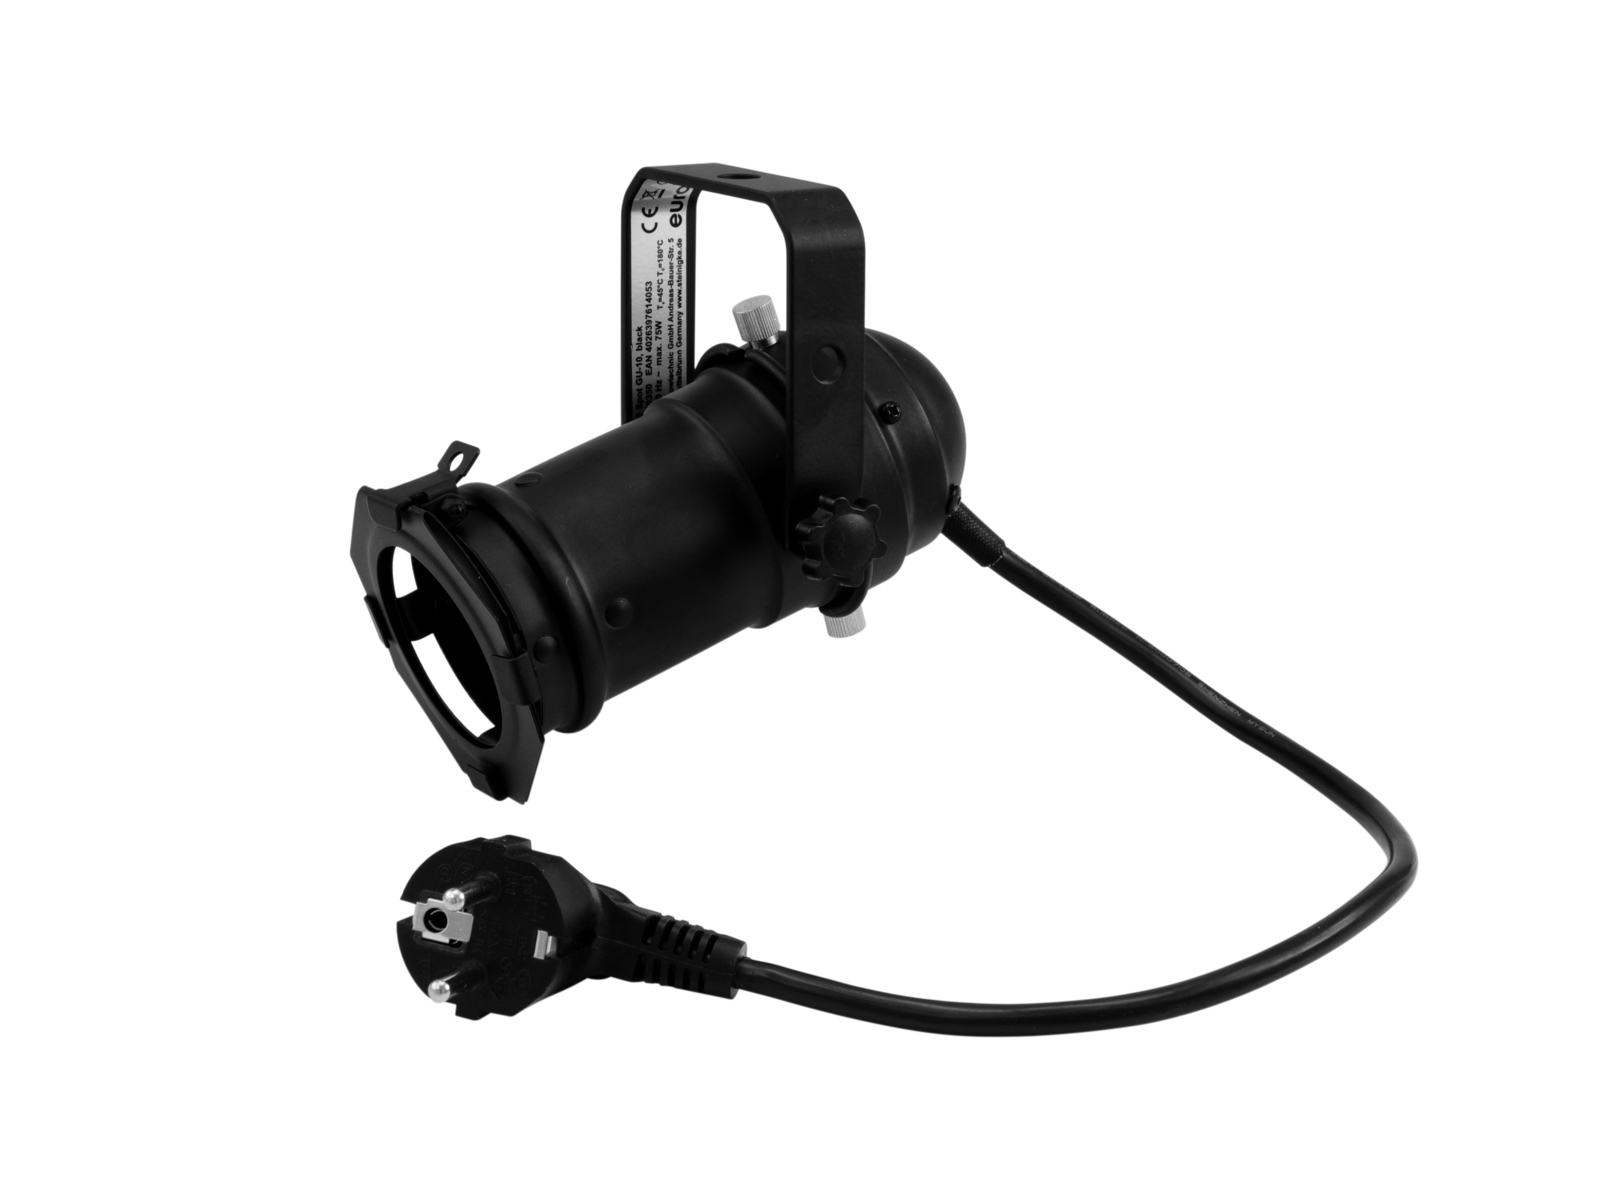 EUROLITE Set PAR-16 Spot GU-10 schwarz + GU-10 230V LED SMD 7W 6400K